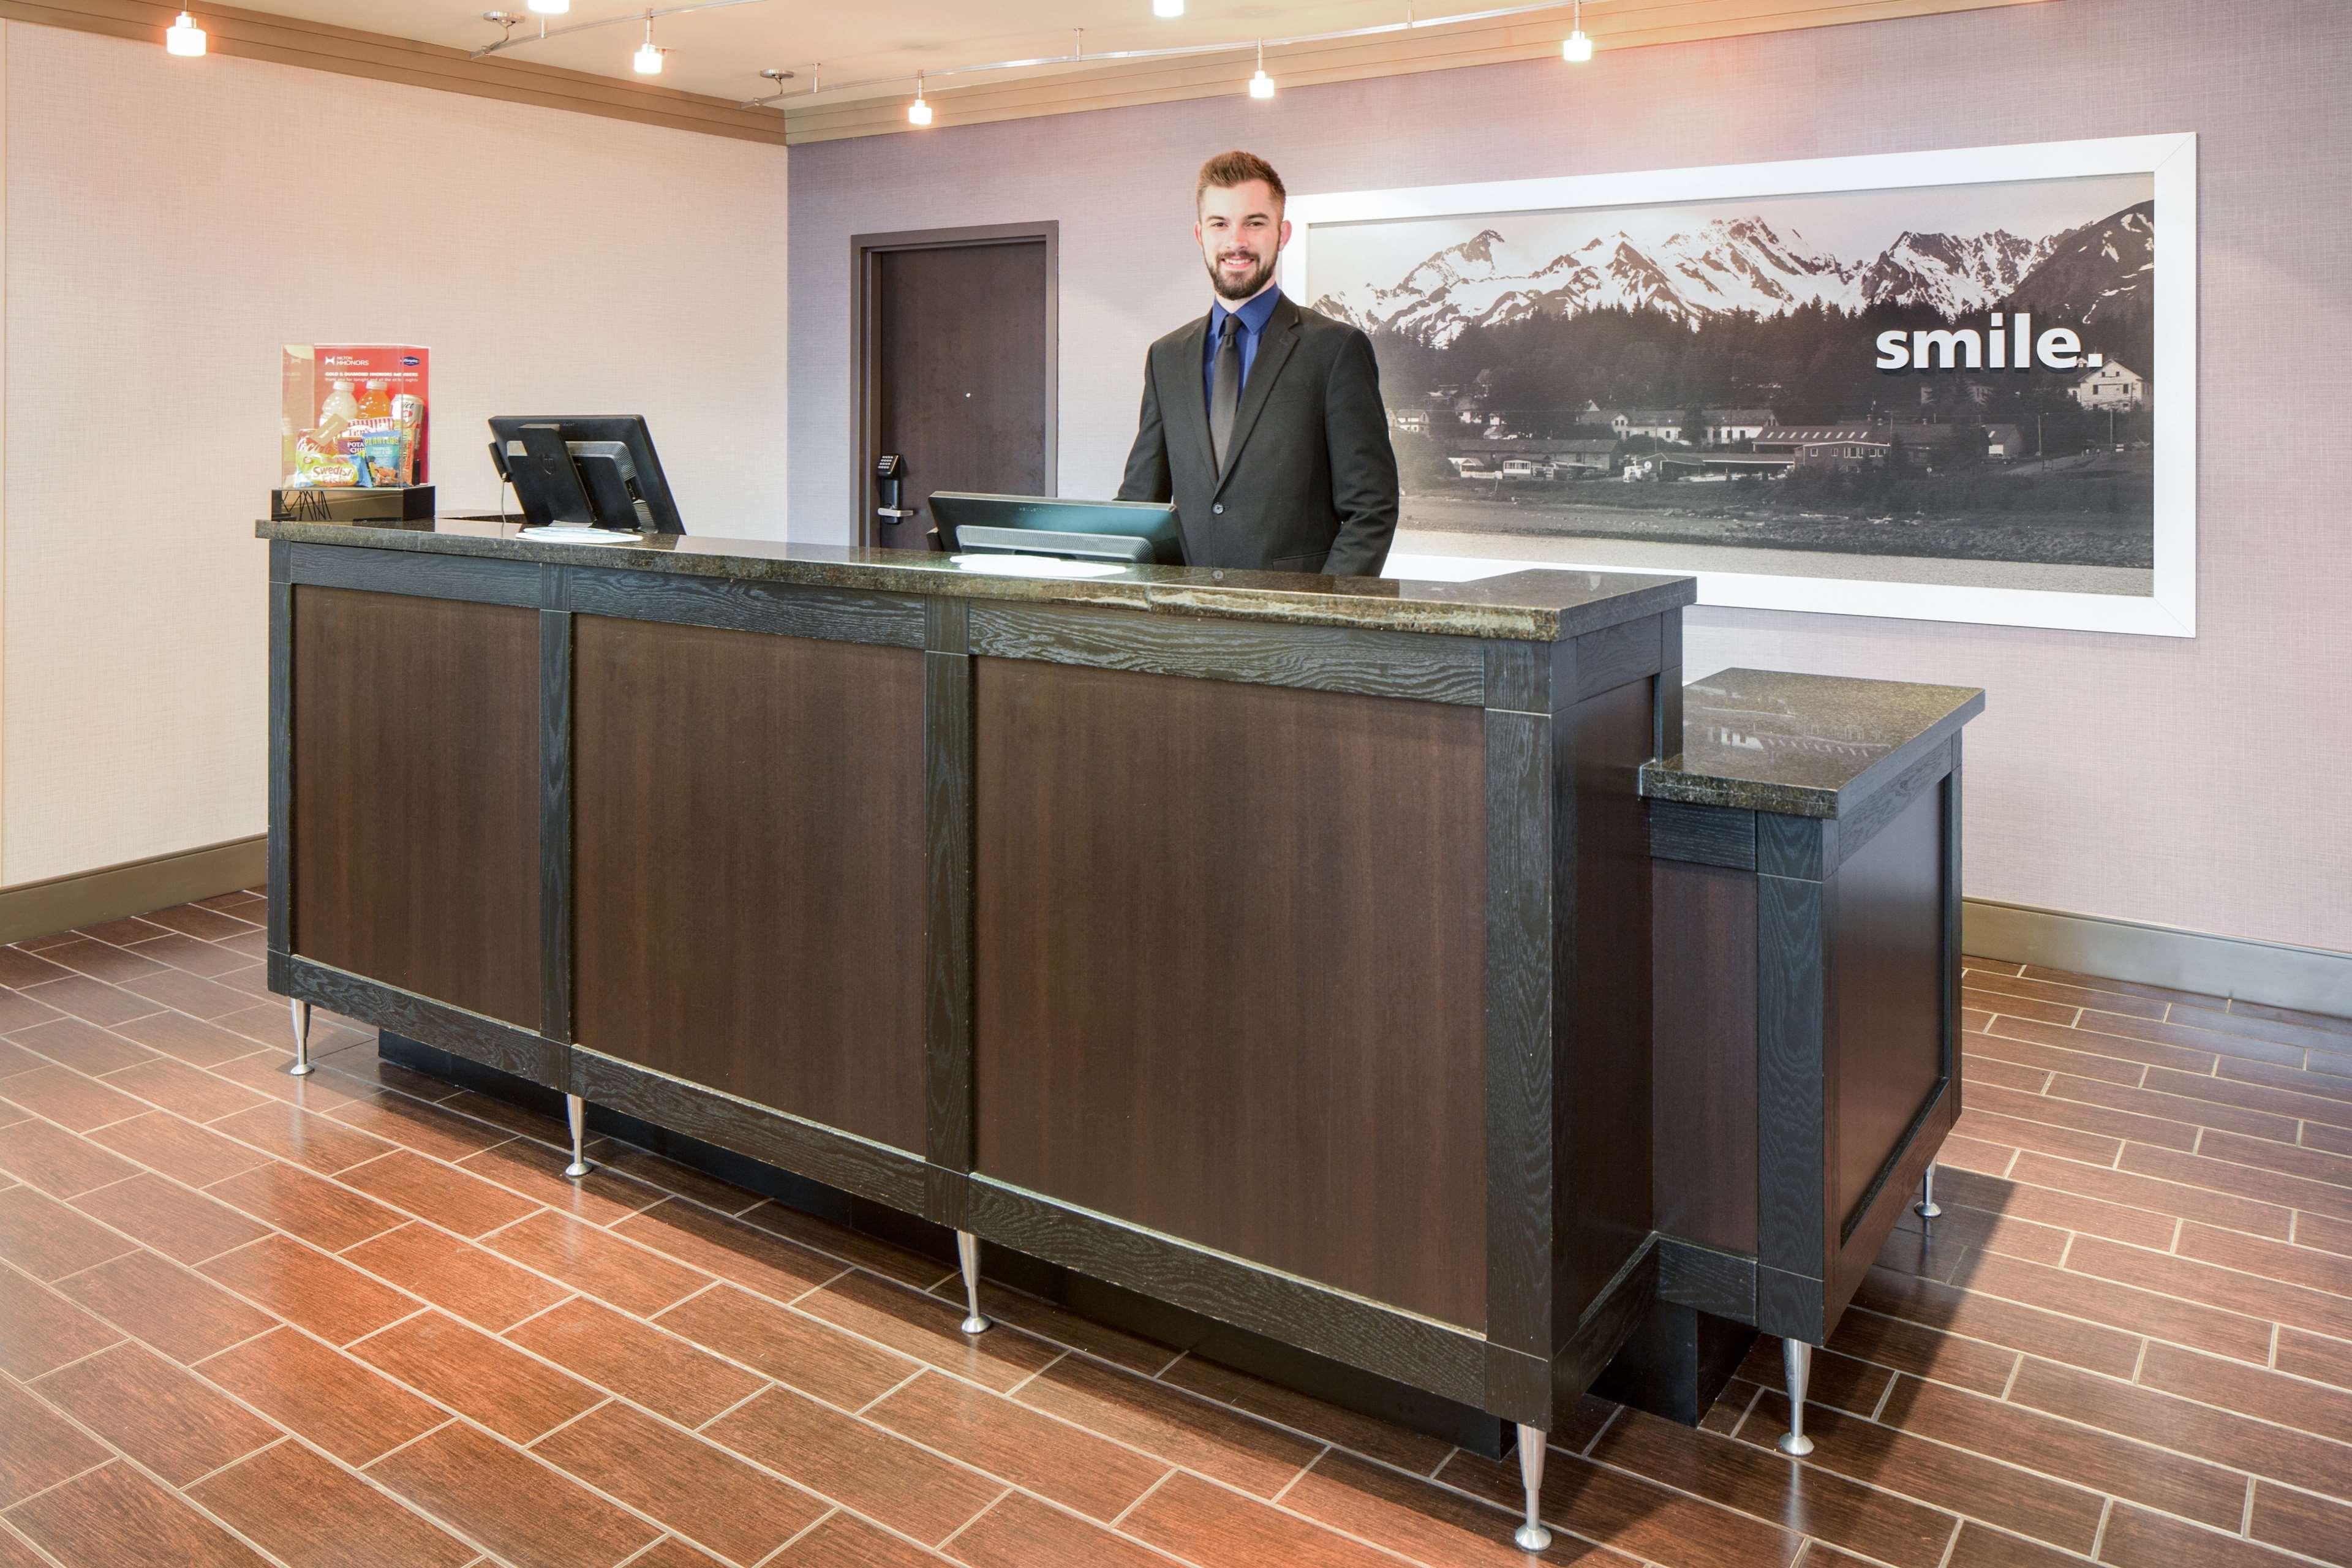 Hampton Inn & Suites Spokane Valley image 6